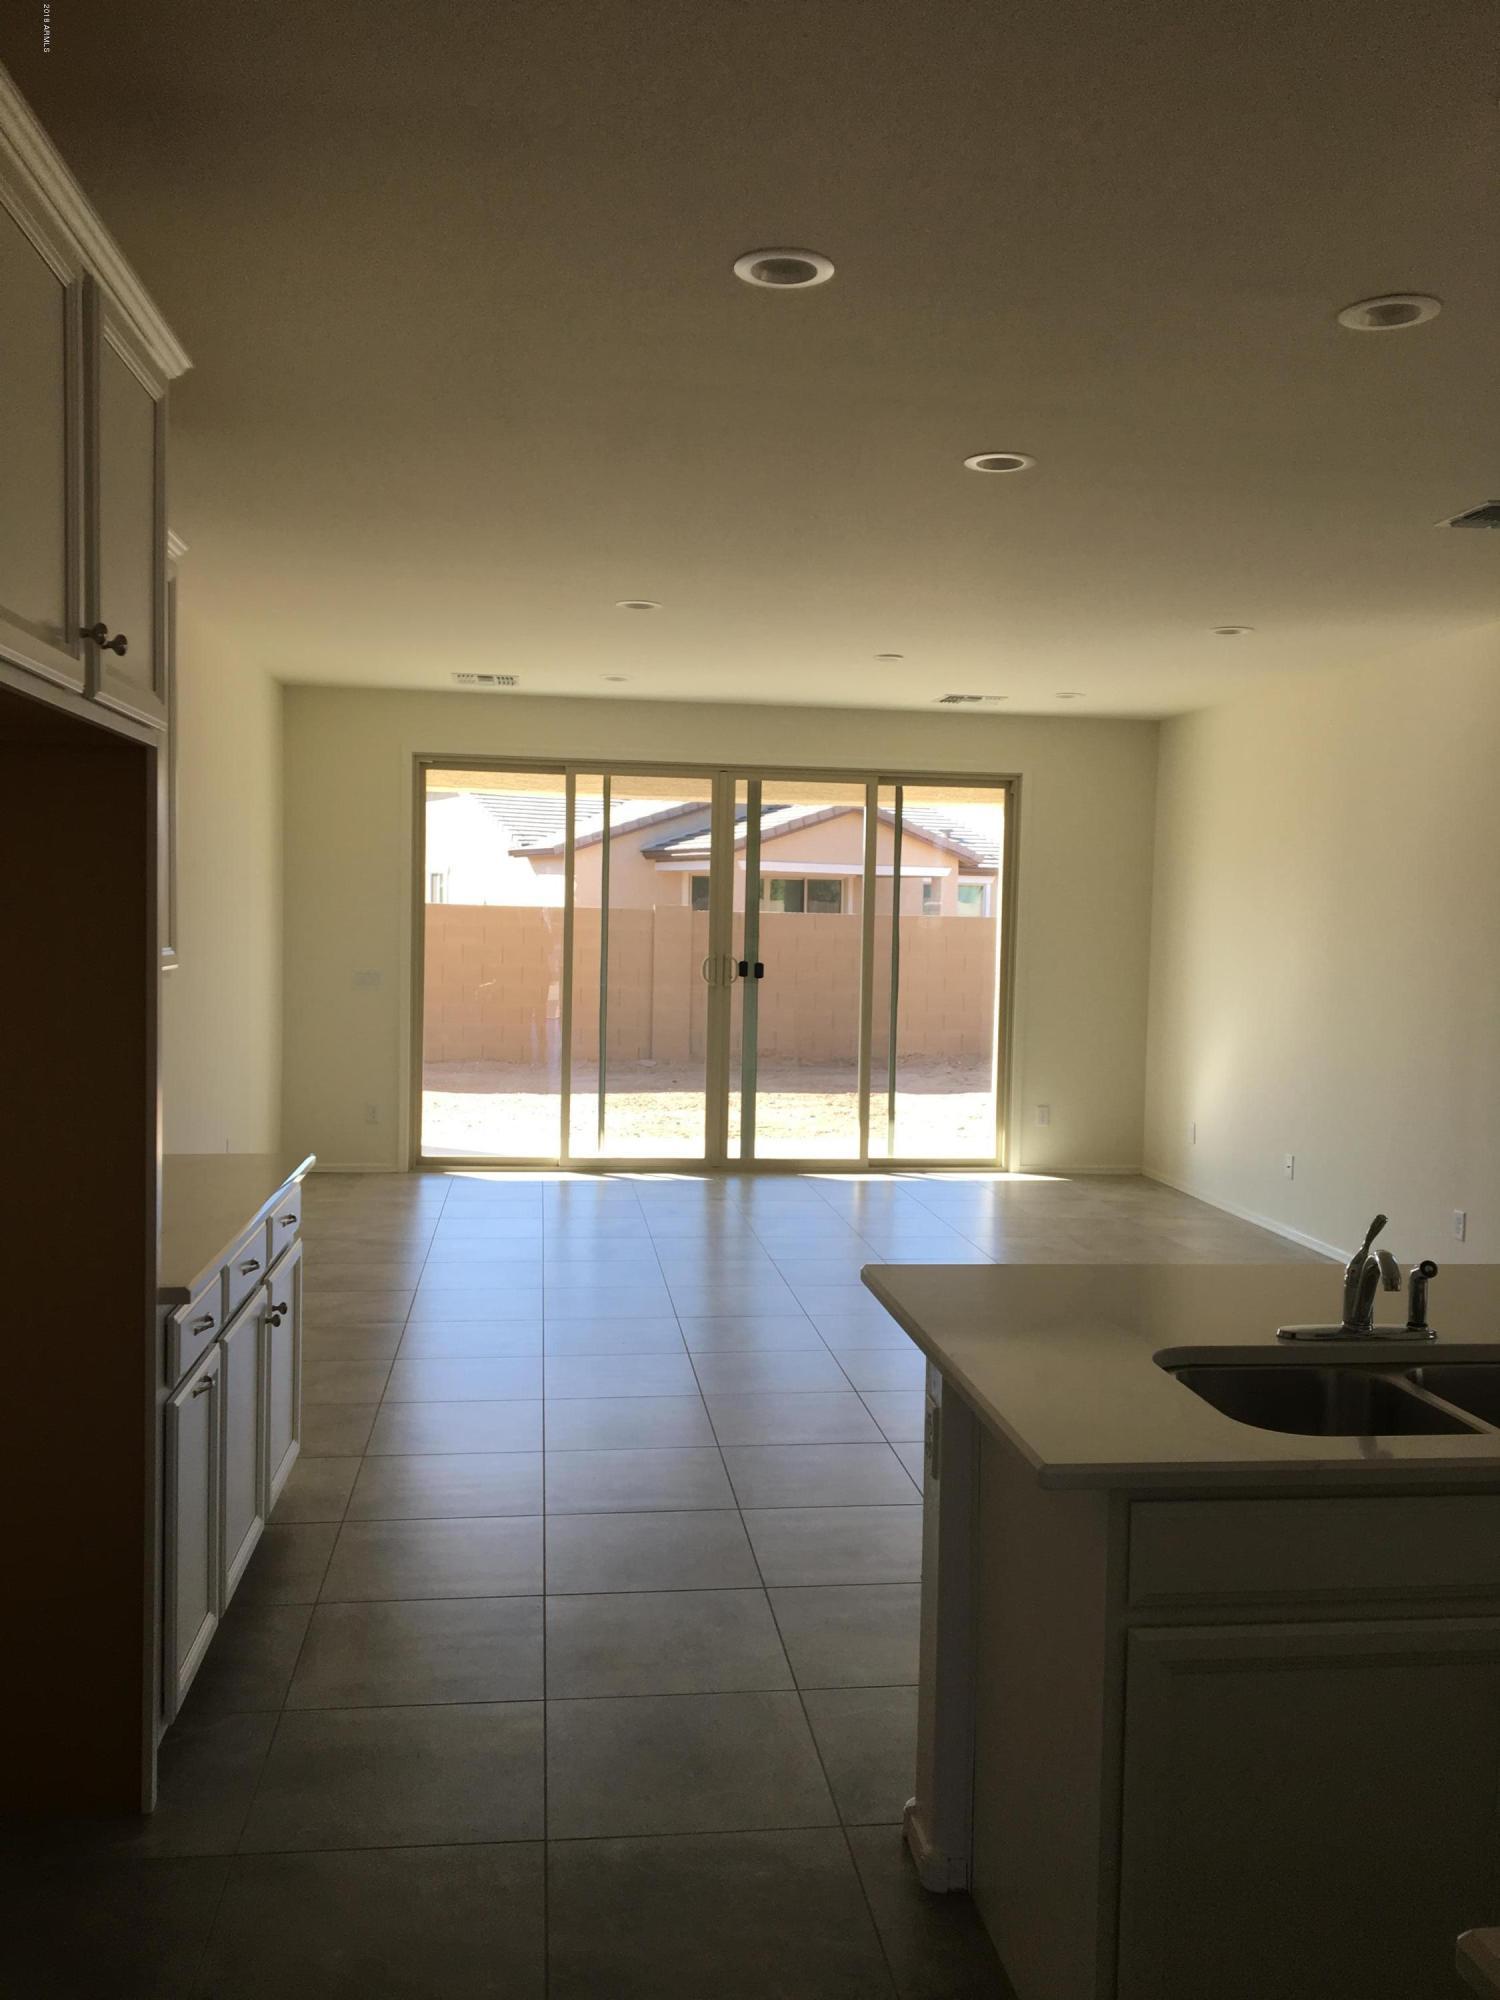 913 E OVERLIN Drive Avondale, AZ 85323 - MLS #: 5859355